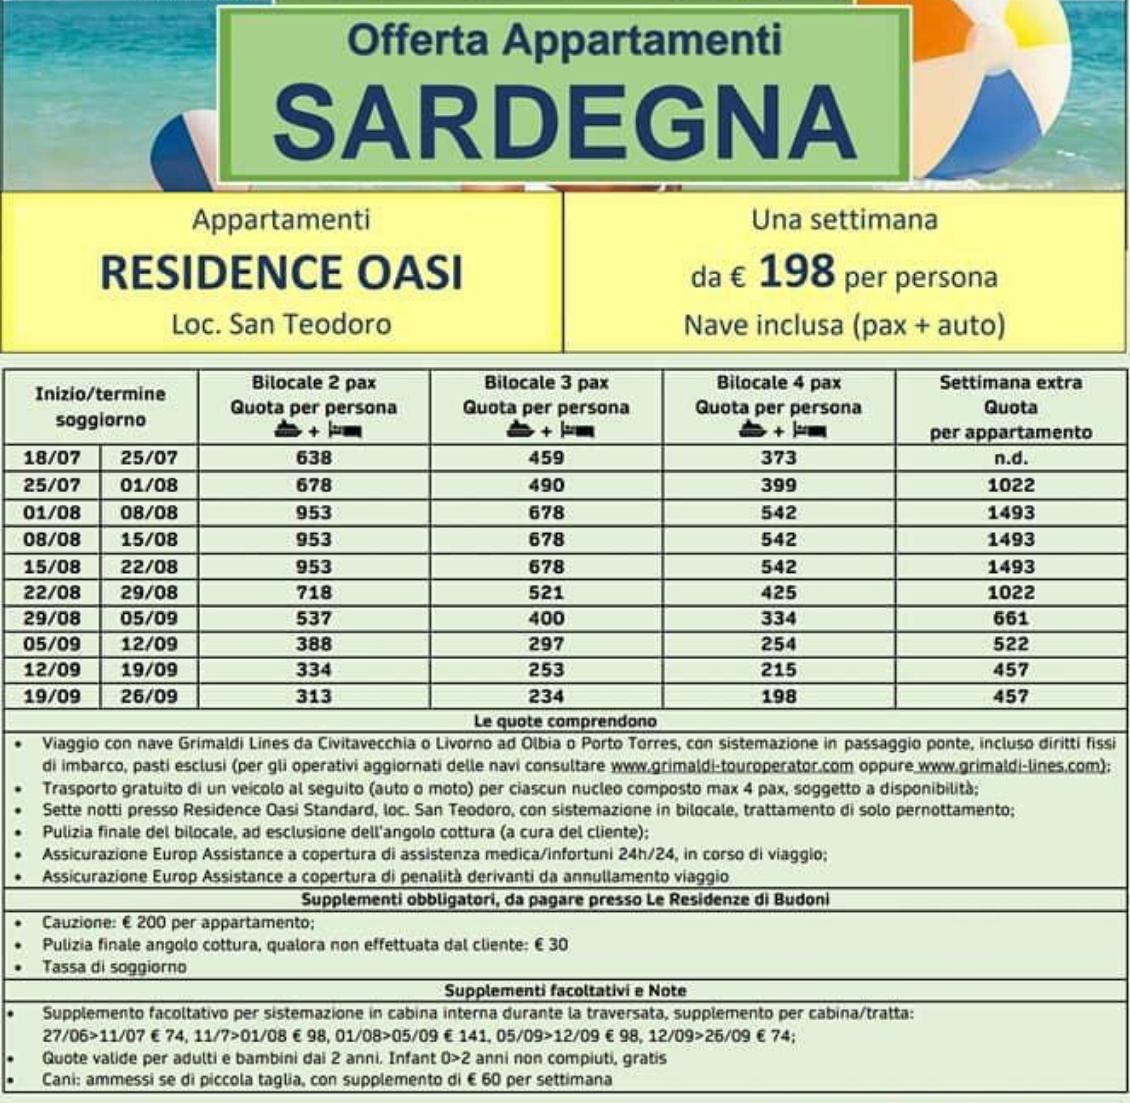 Offerta Appartamenti in Sardegna Residence Oasi